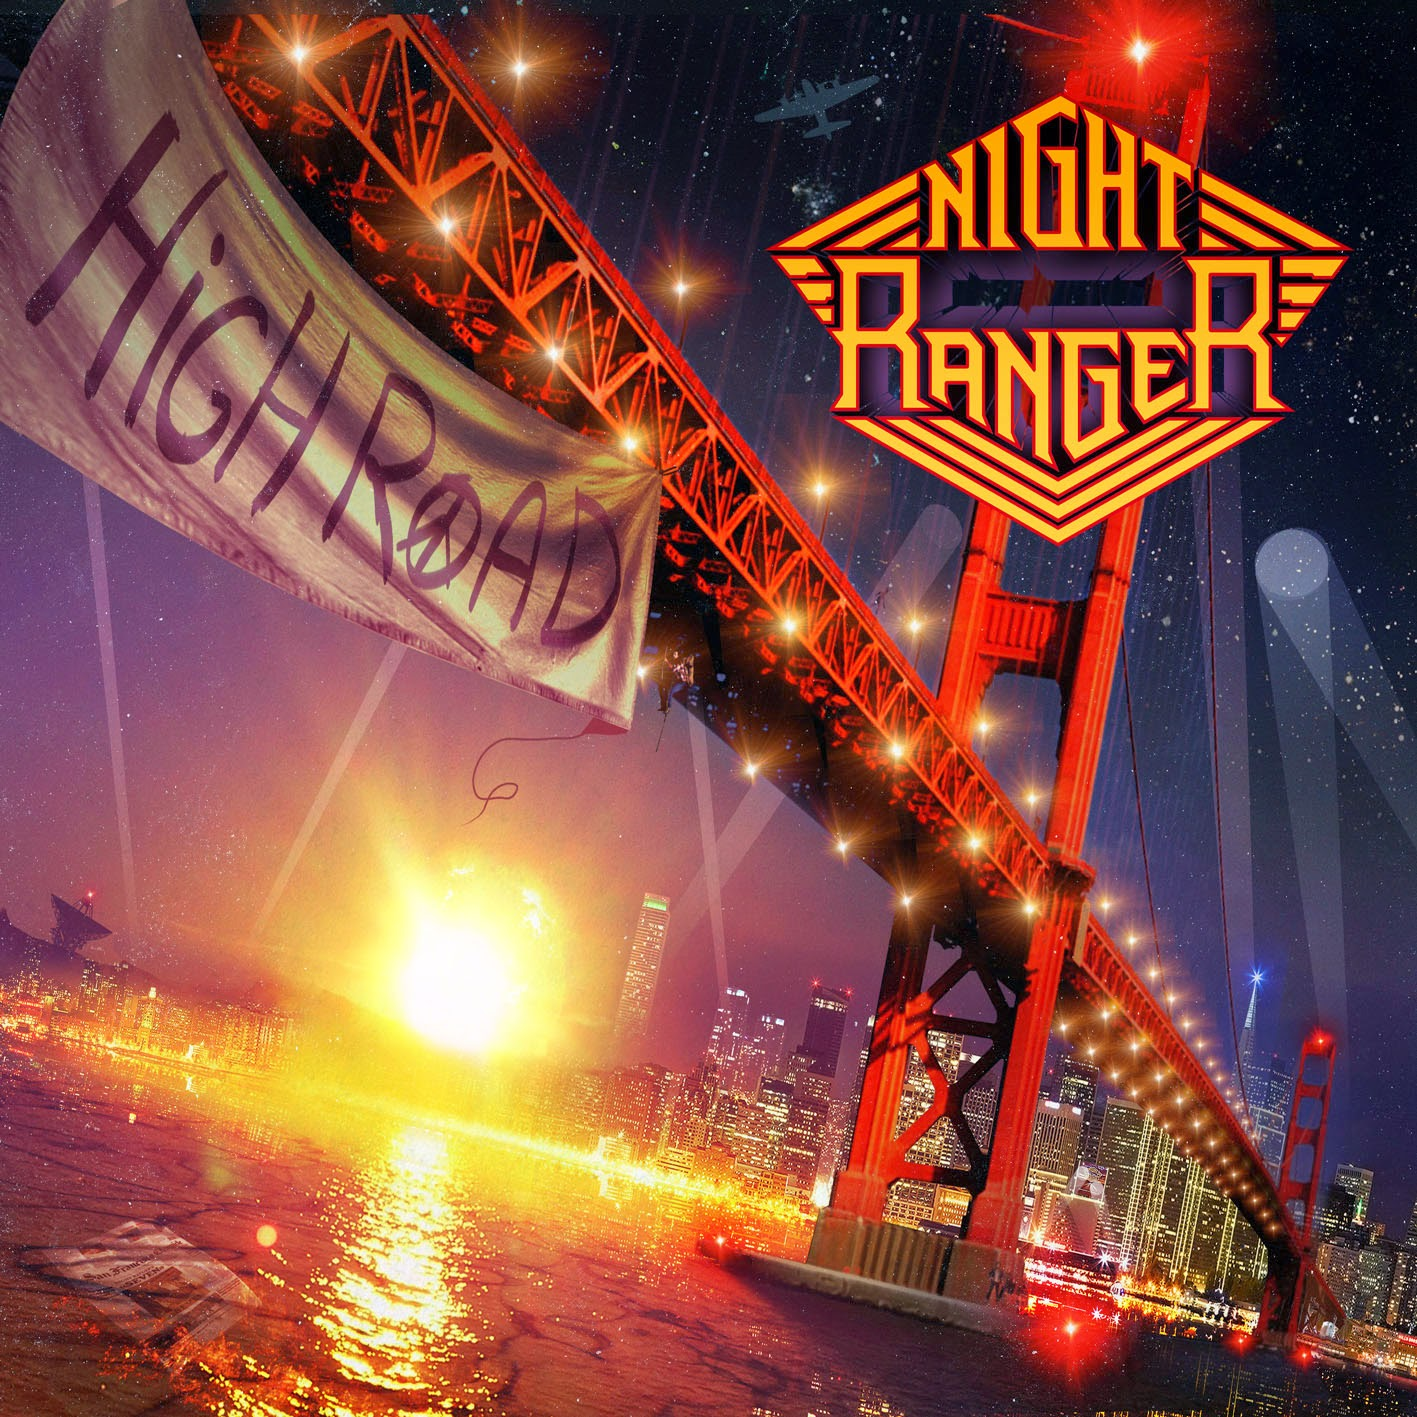 Nightranger - High Road